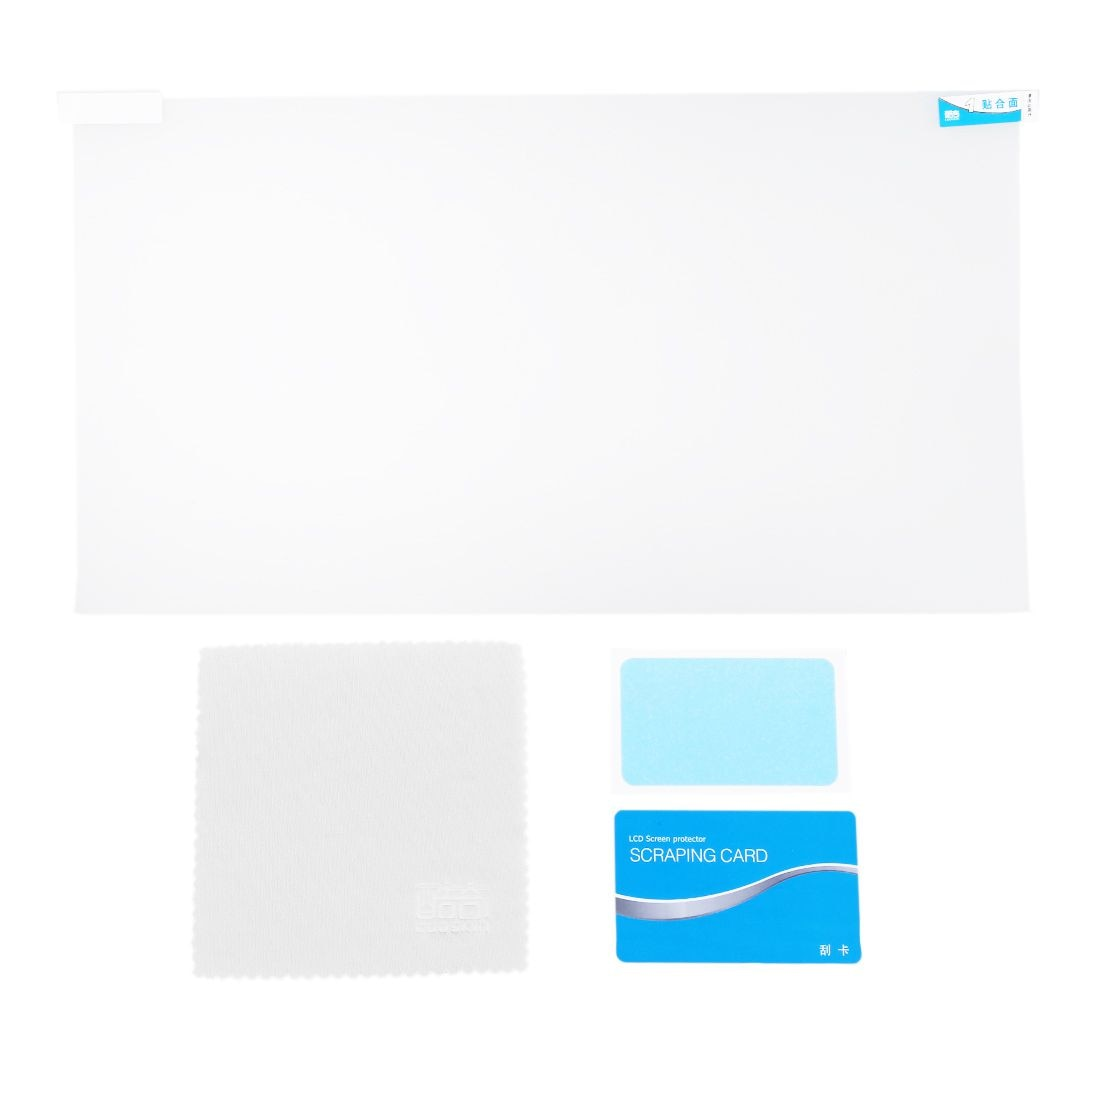 Caliente-COOSKIN 15,6 pulgadas Protector de pantalla Anti-reflejo para portátil Pantalla 169 transparente